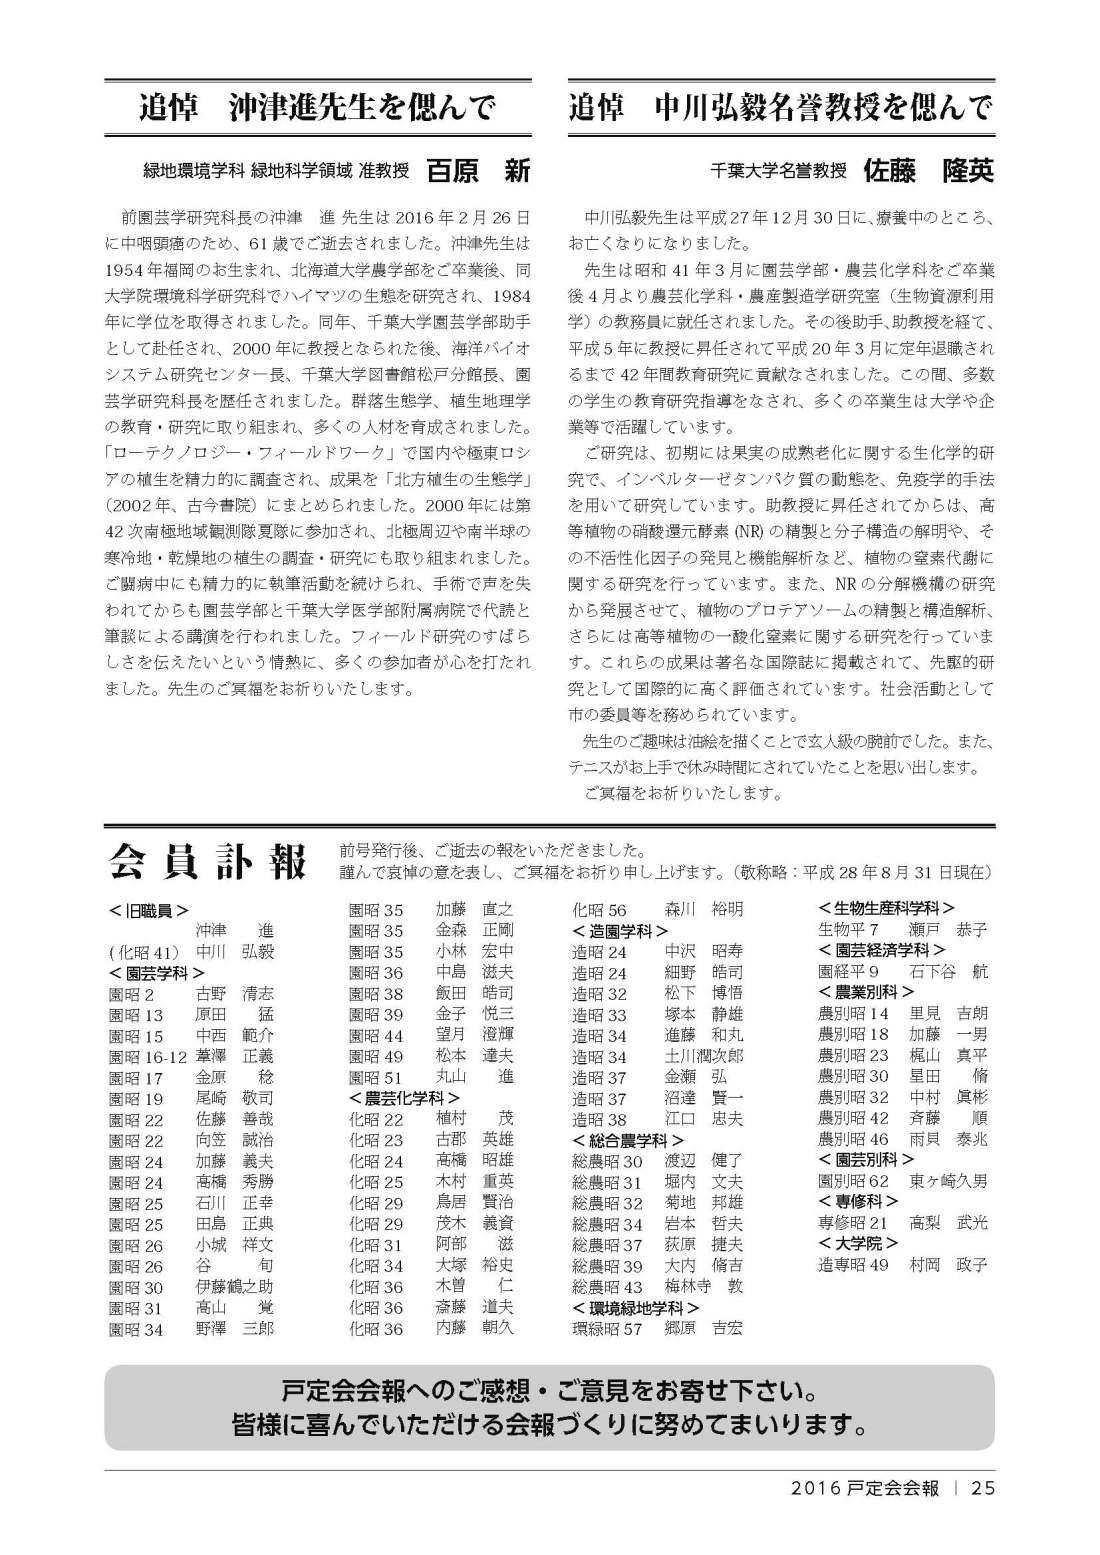 tojoukaikaiho_1609s_%e3%83%9a%e3%83%bc%e3%82%b8_25